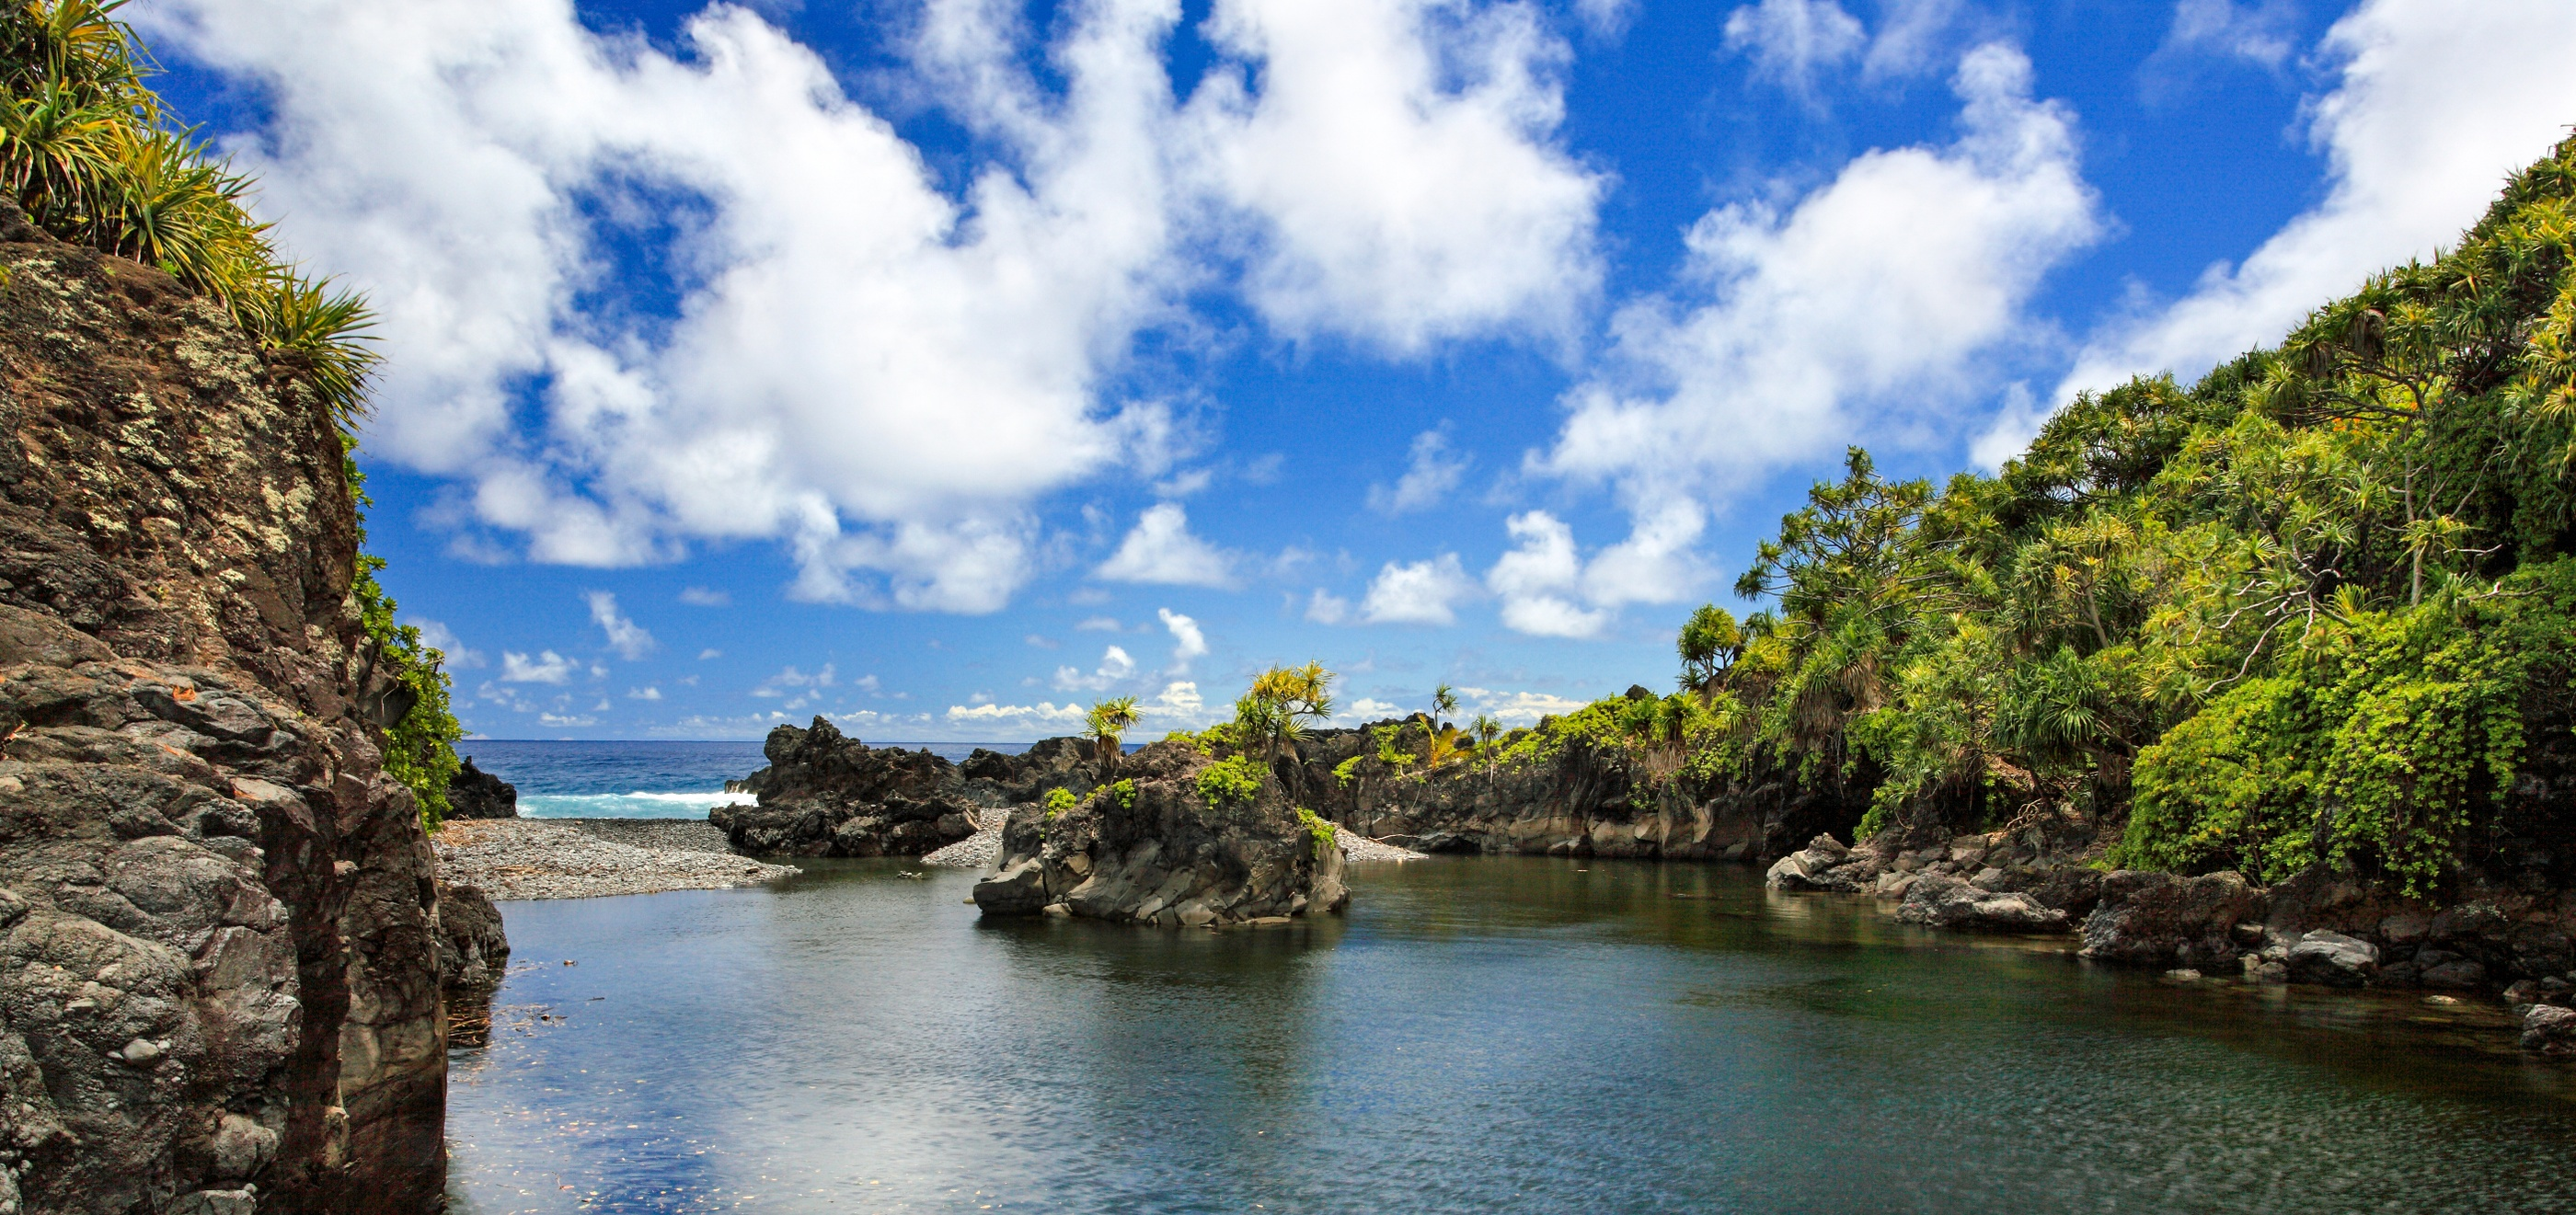 Maui home search cover